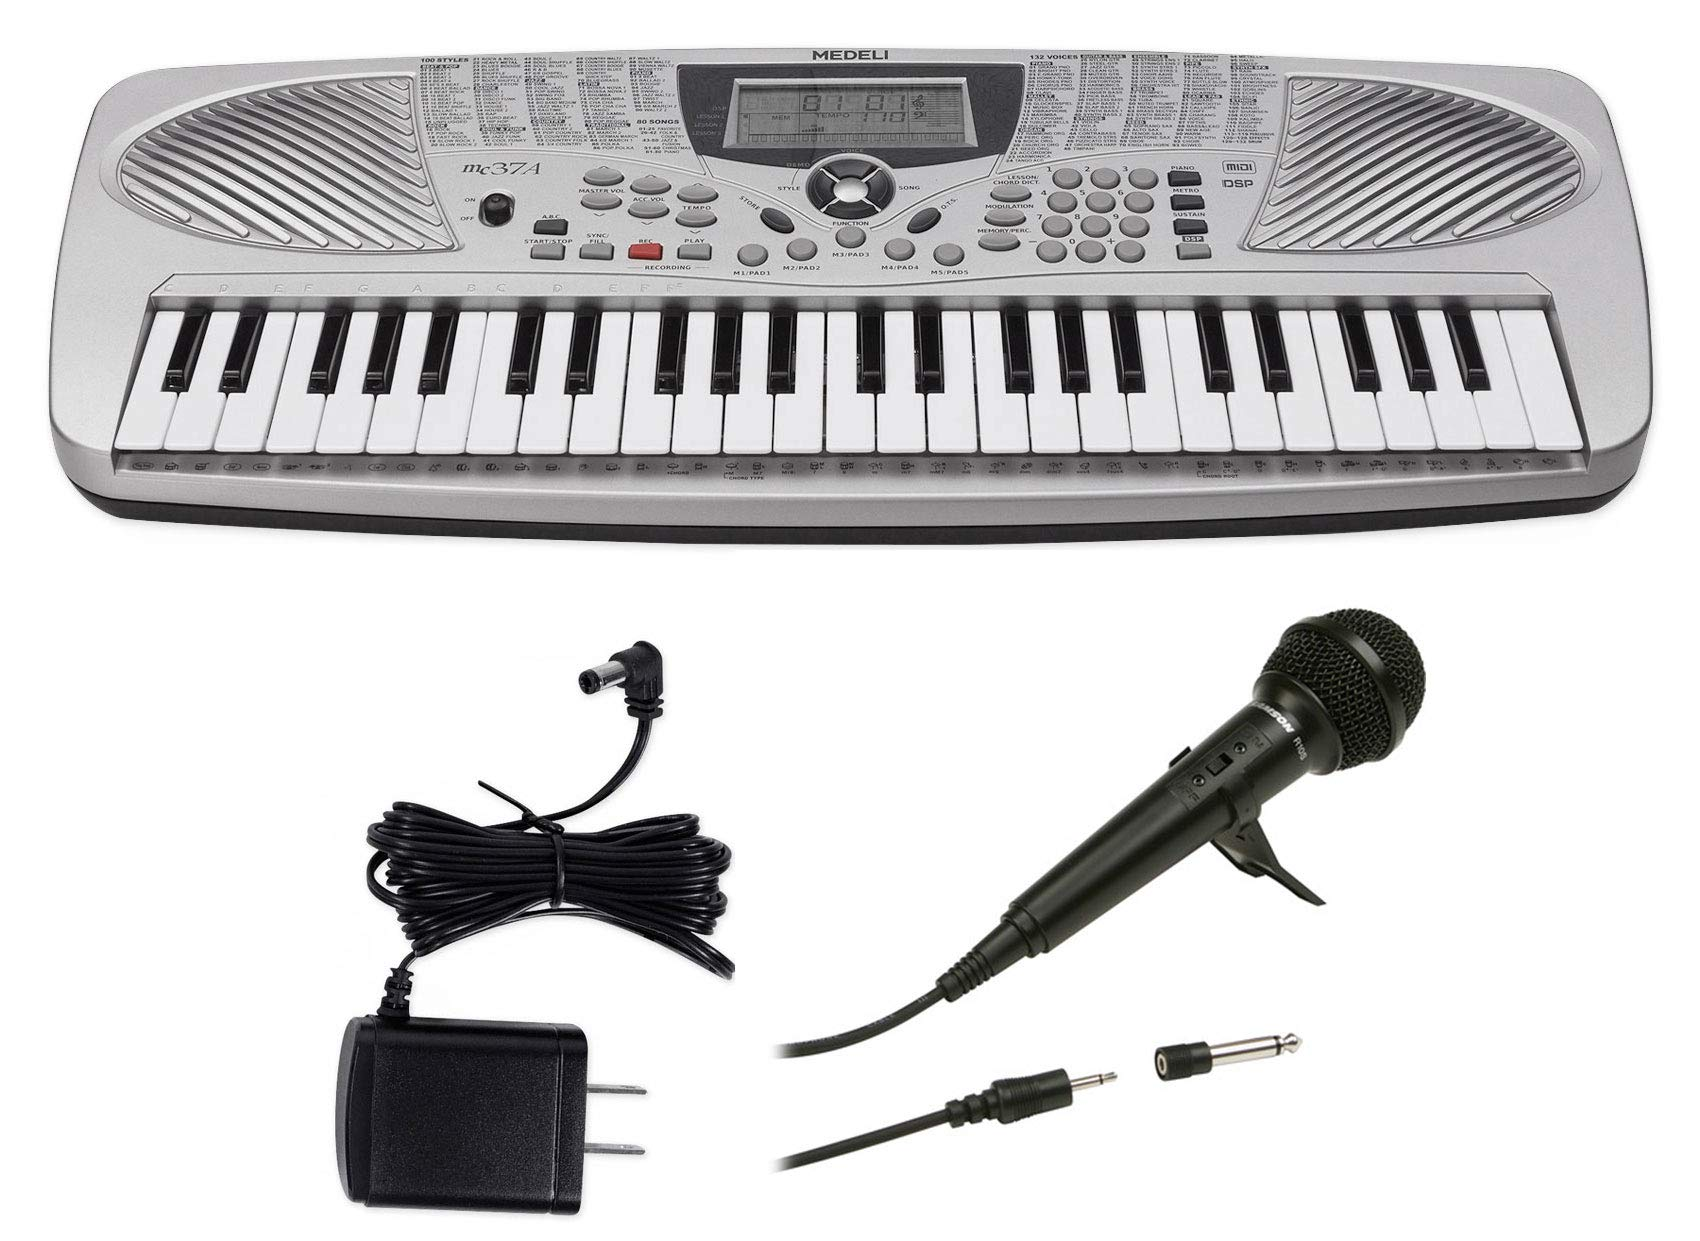 MEDELI MC37A 49-Key USB Portable Keyboard + Power Supply + Microphone